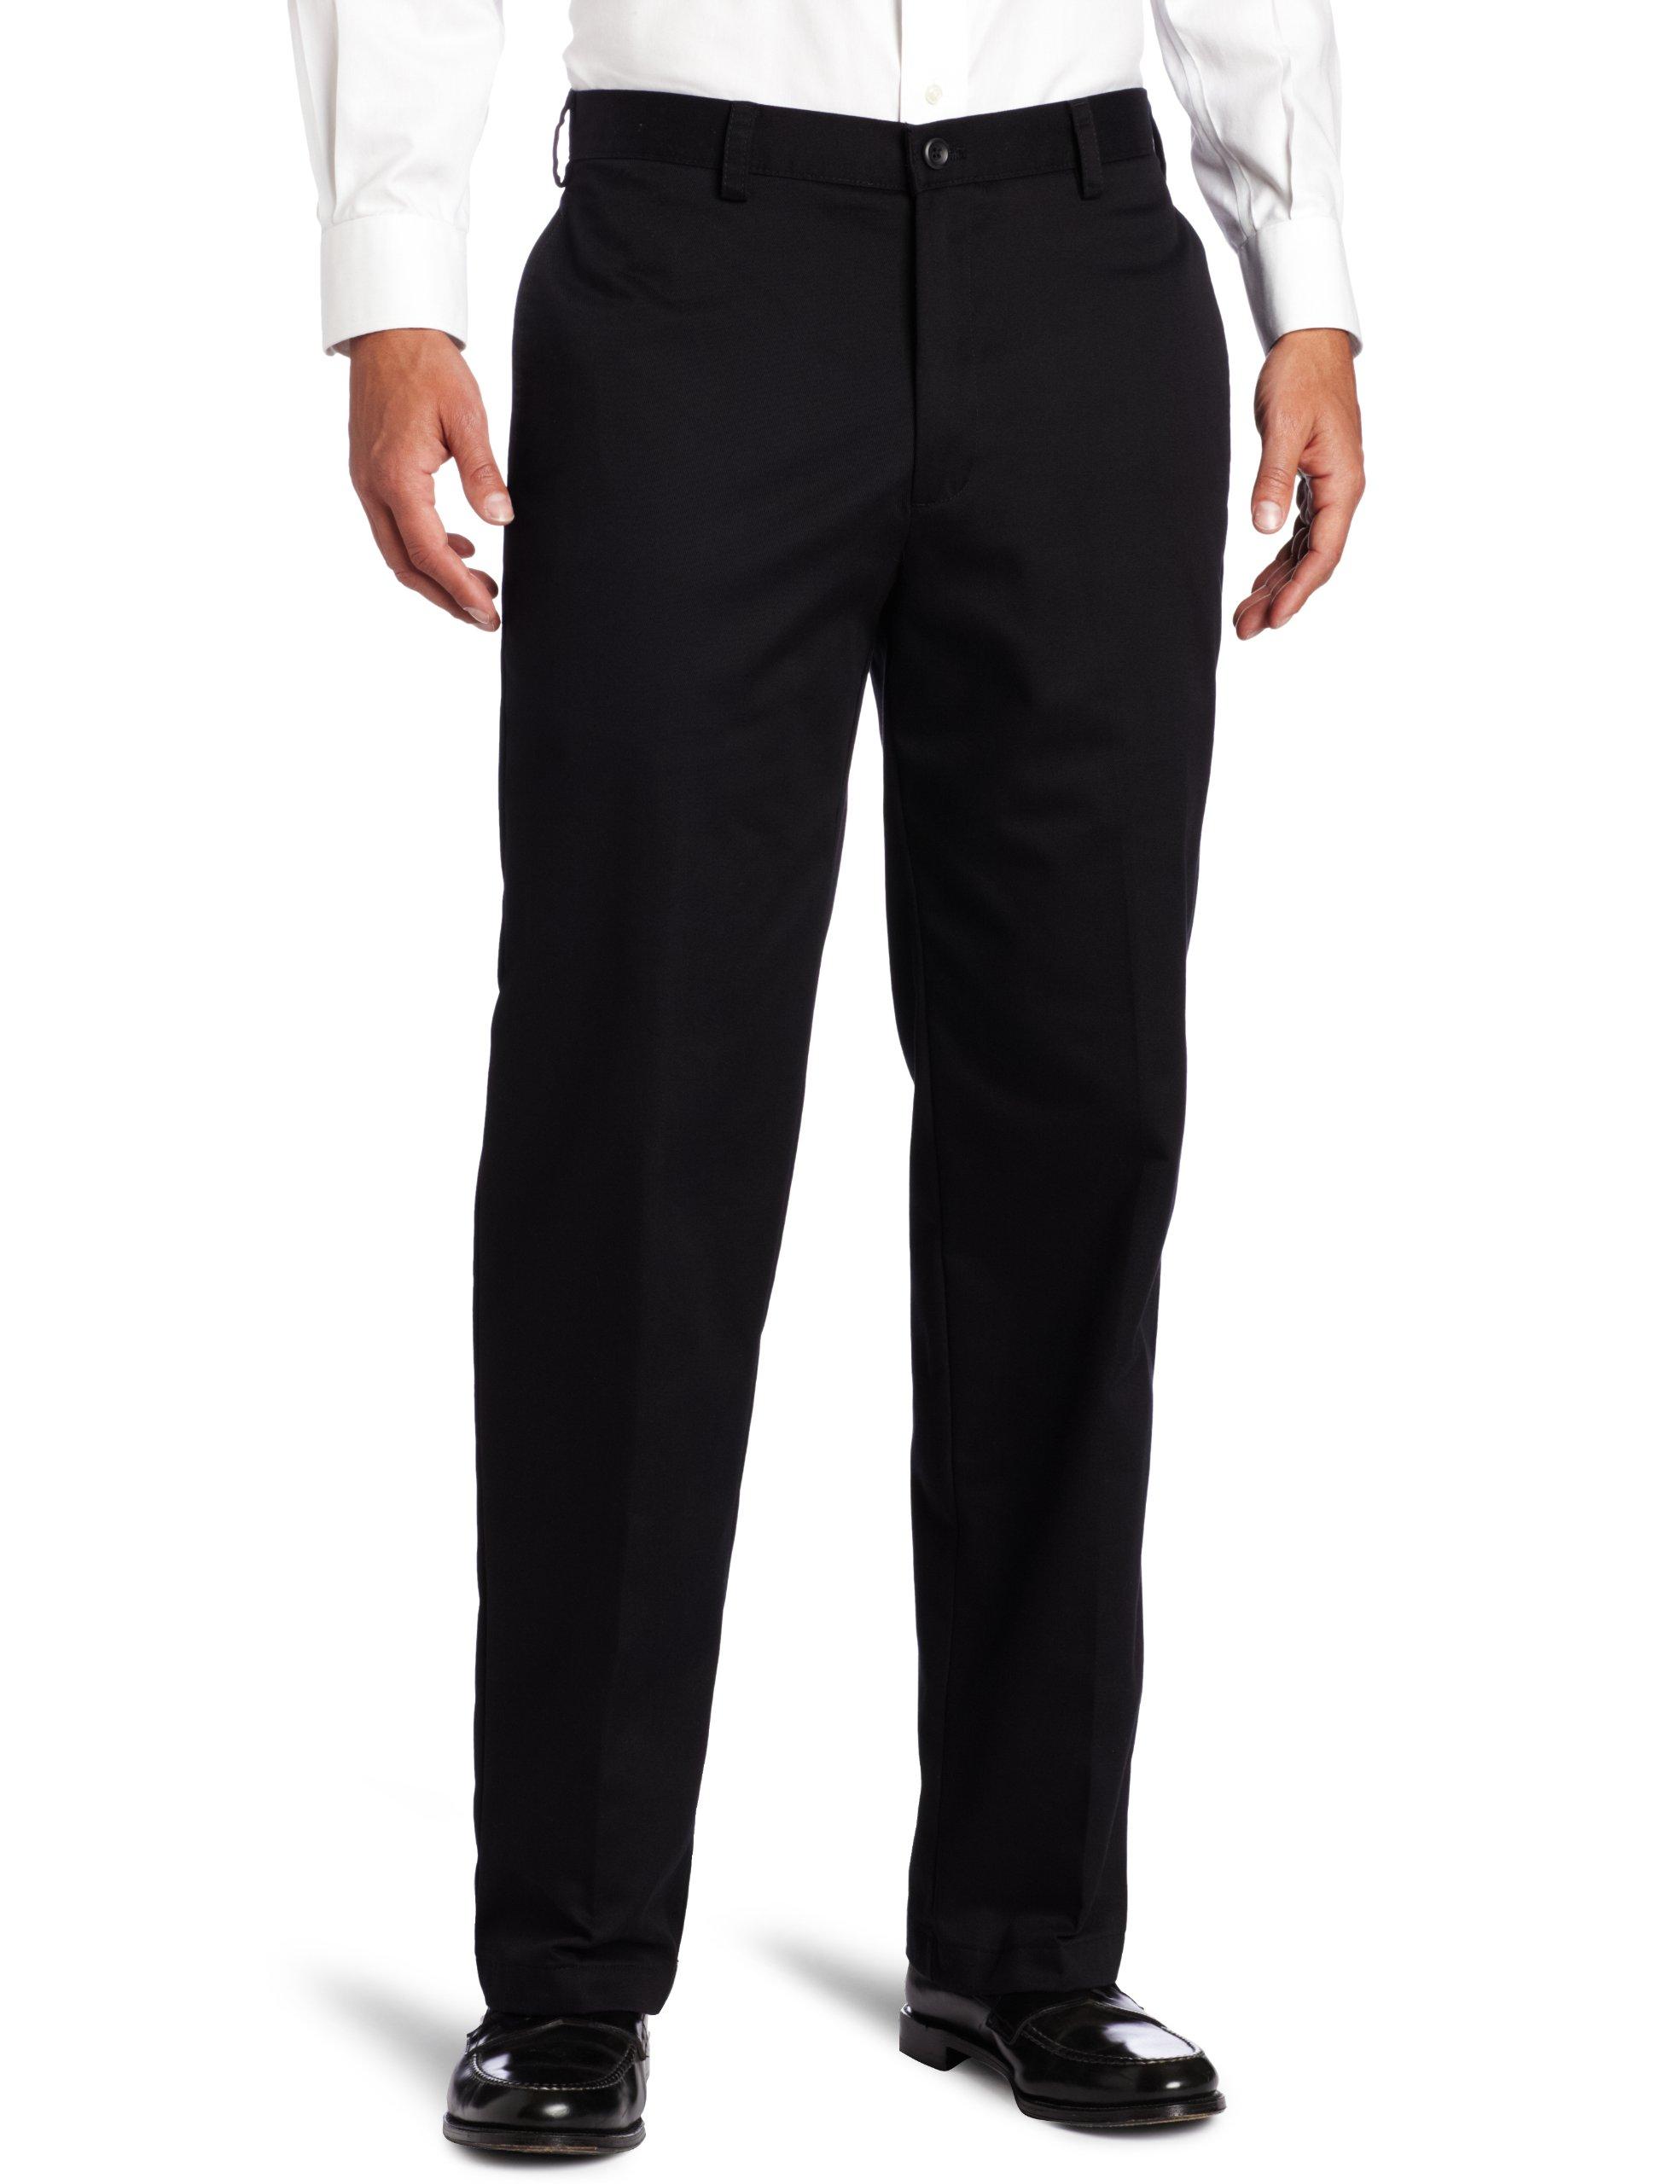 IZOD Men's American Chino Flat Front Pant, Black, 32W x 32L